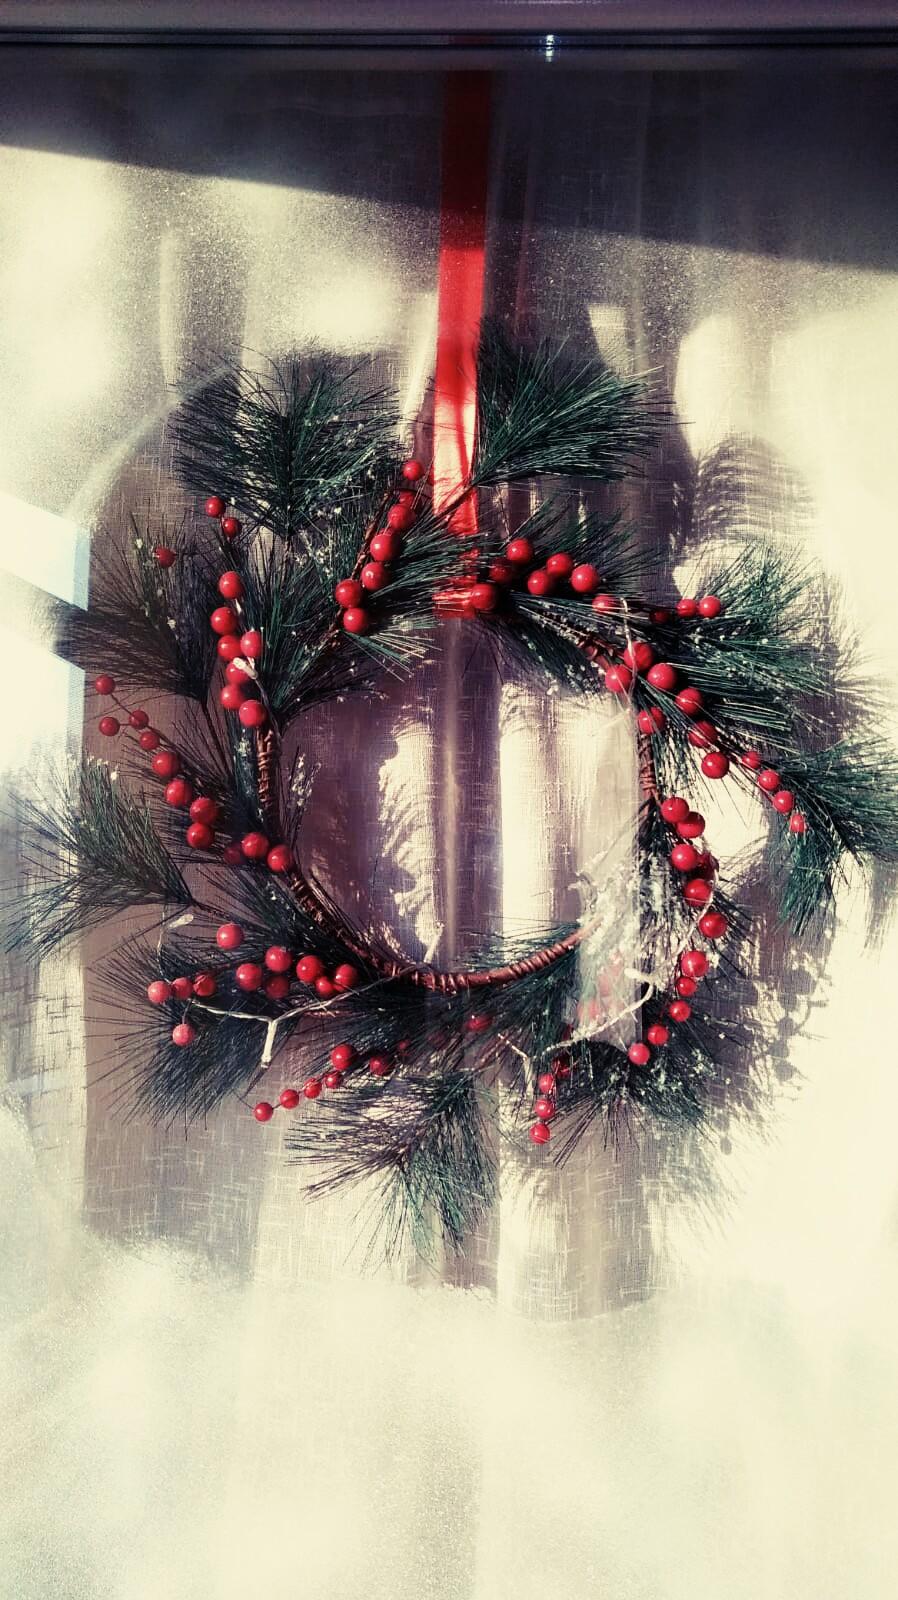 Ghirlanda natalizia